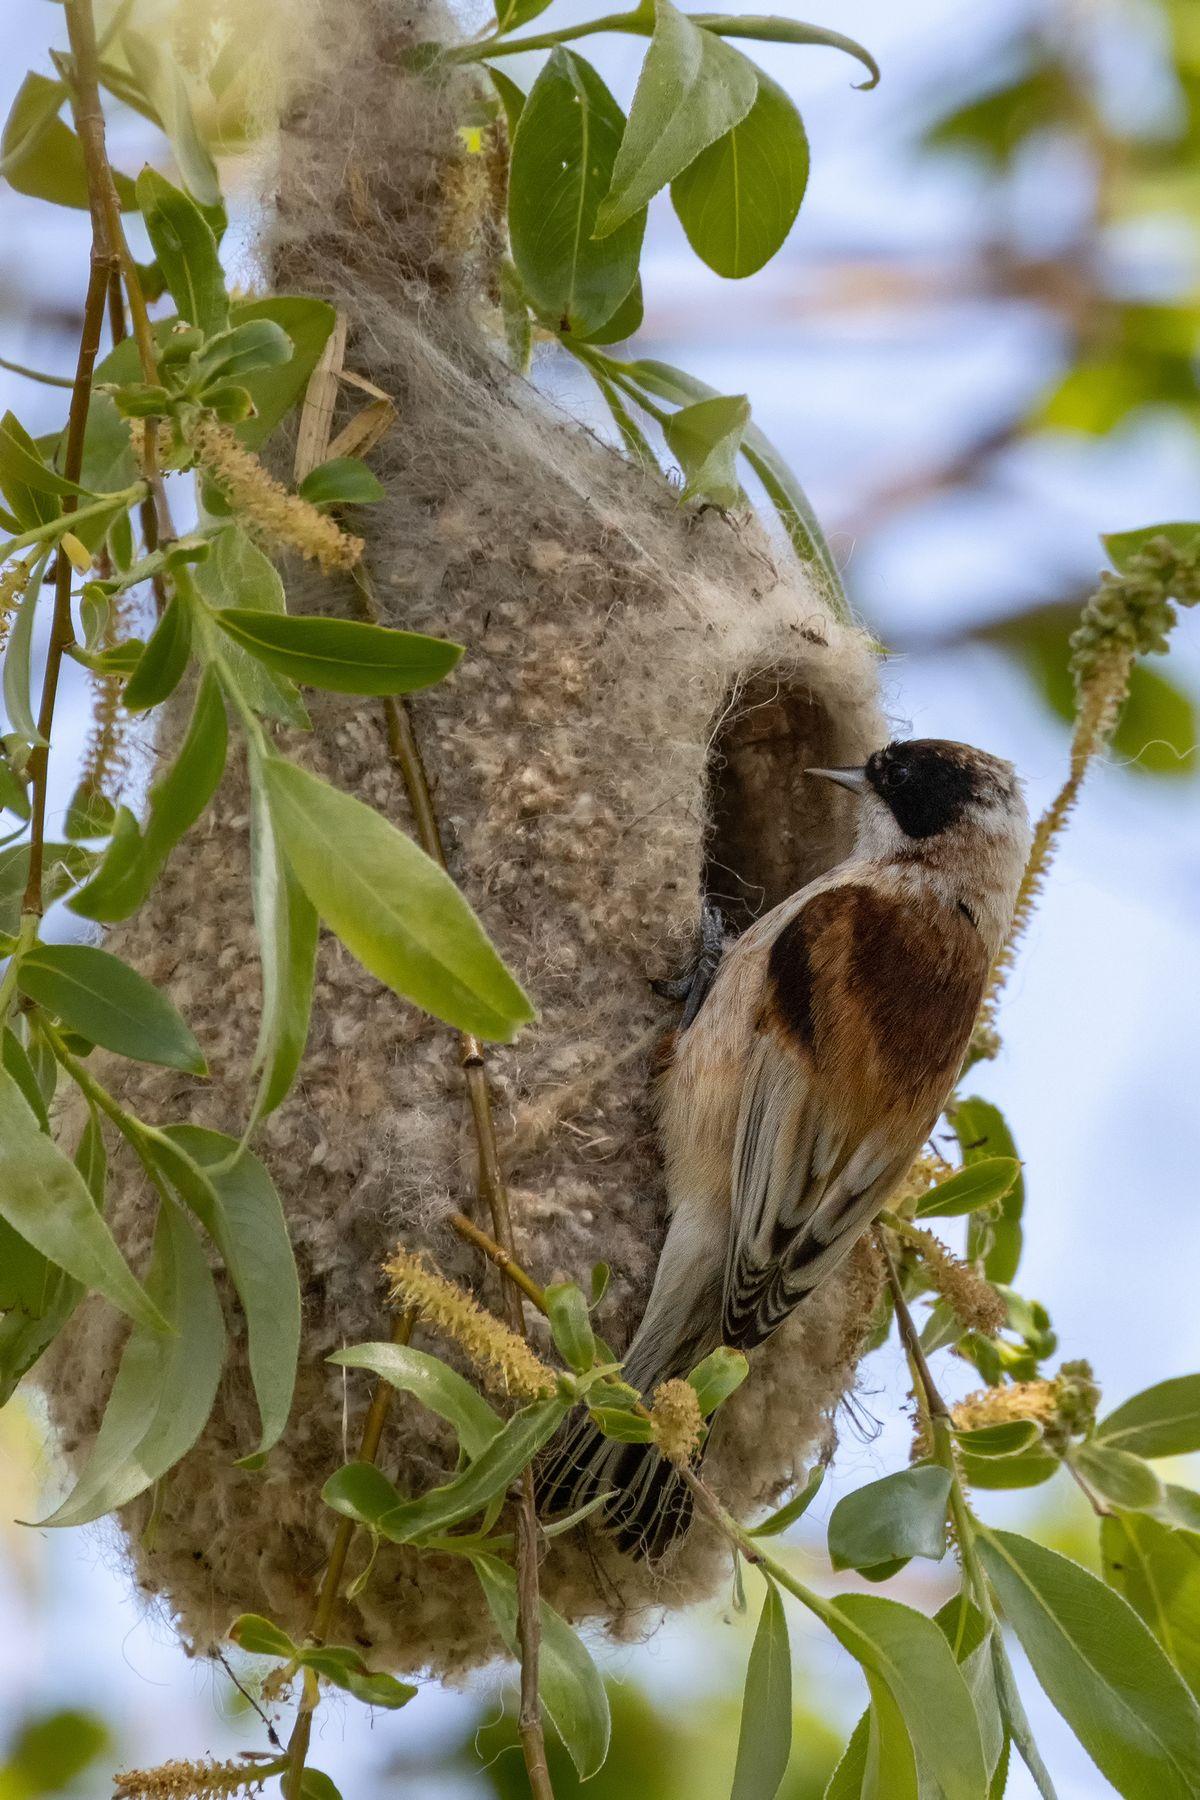 Ремез (Remiz pendulinus) Ремез Remiz pendulinus птицы птица пернатые